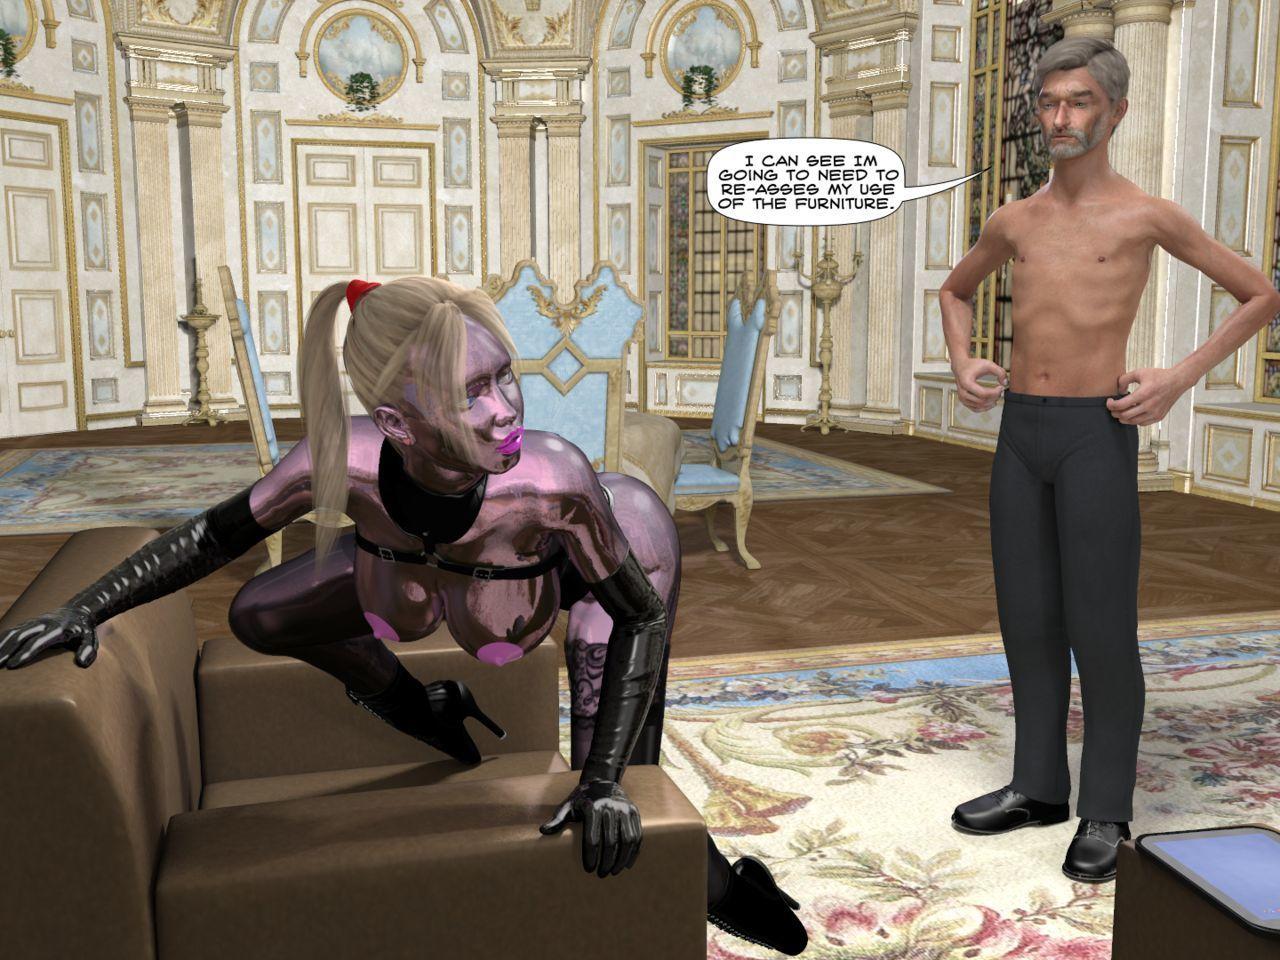 [Telsis] The Trophy Wife Part 1 - part 4